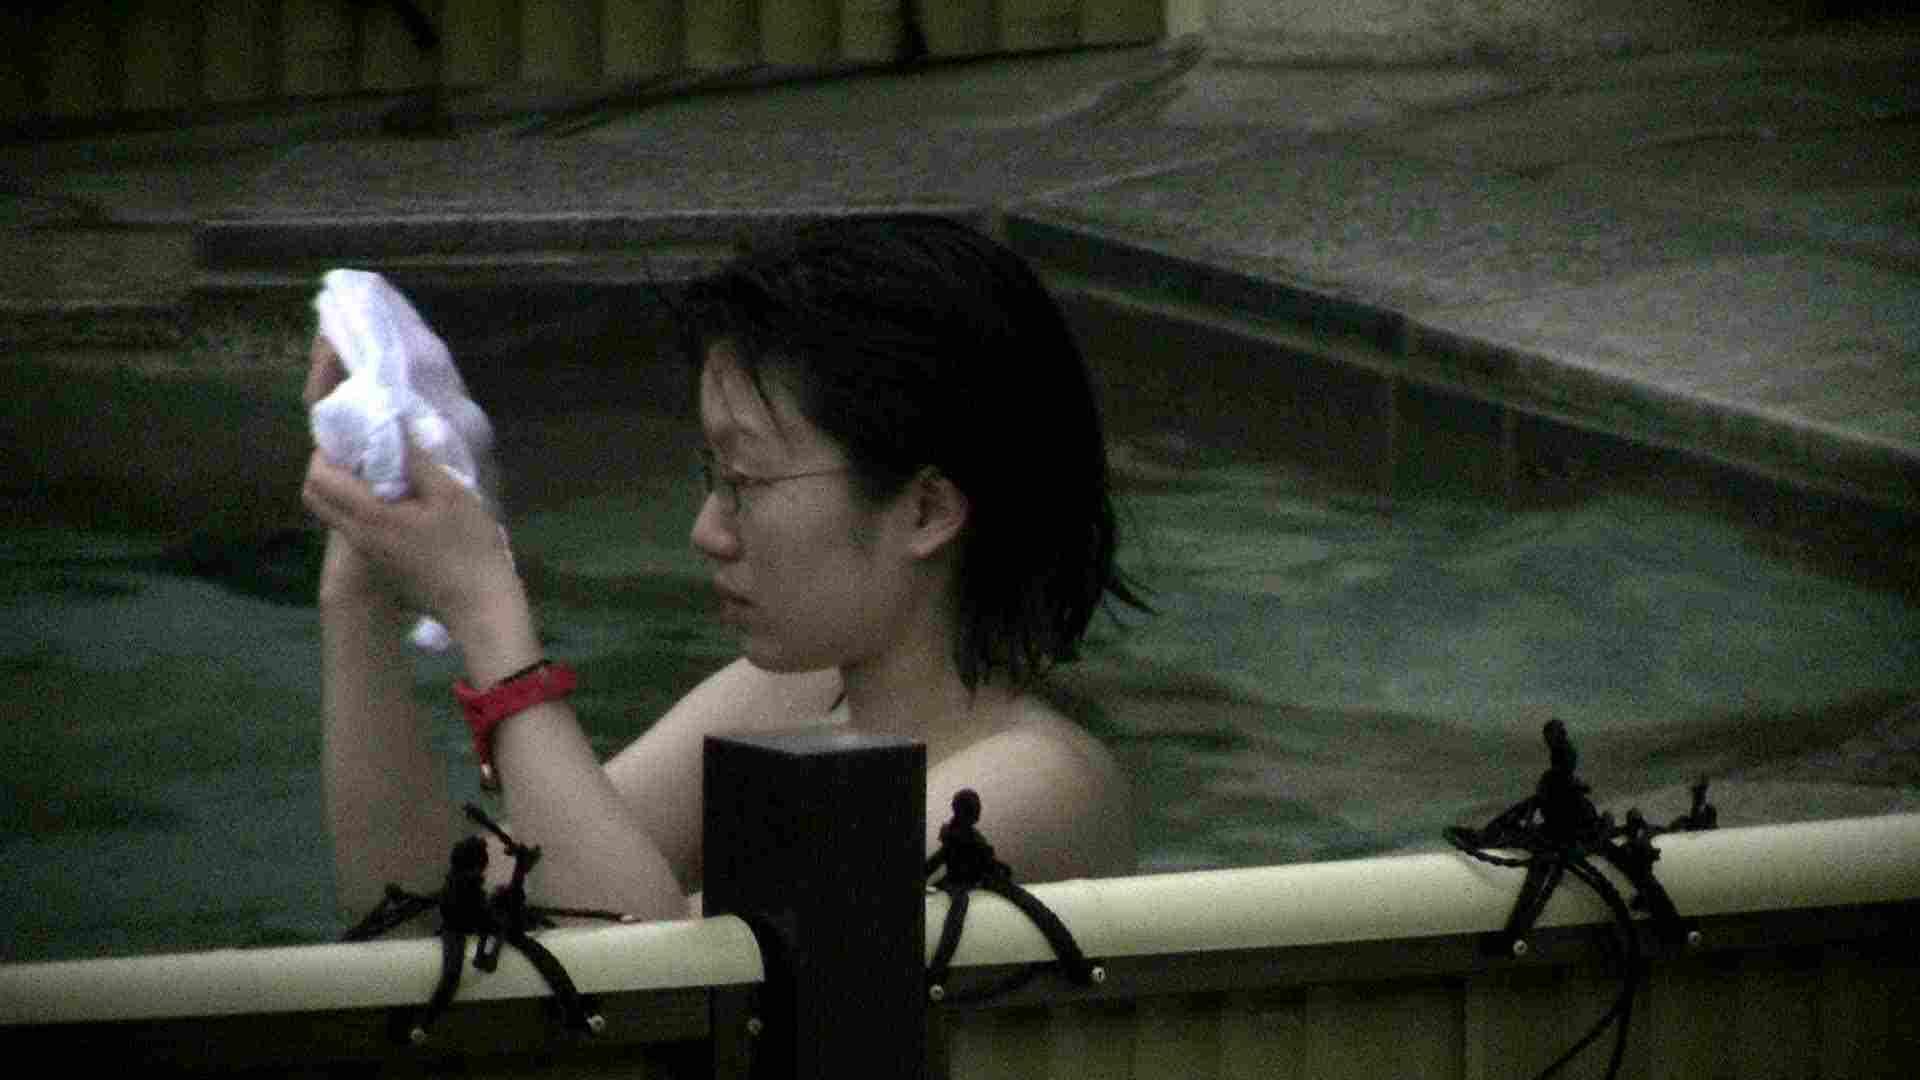 Aquaな露天風呂Vol.684 OLのエロ生活   露天風呂  59連発 13